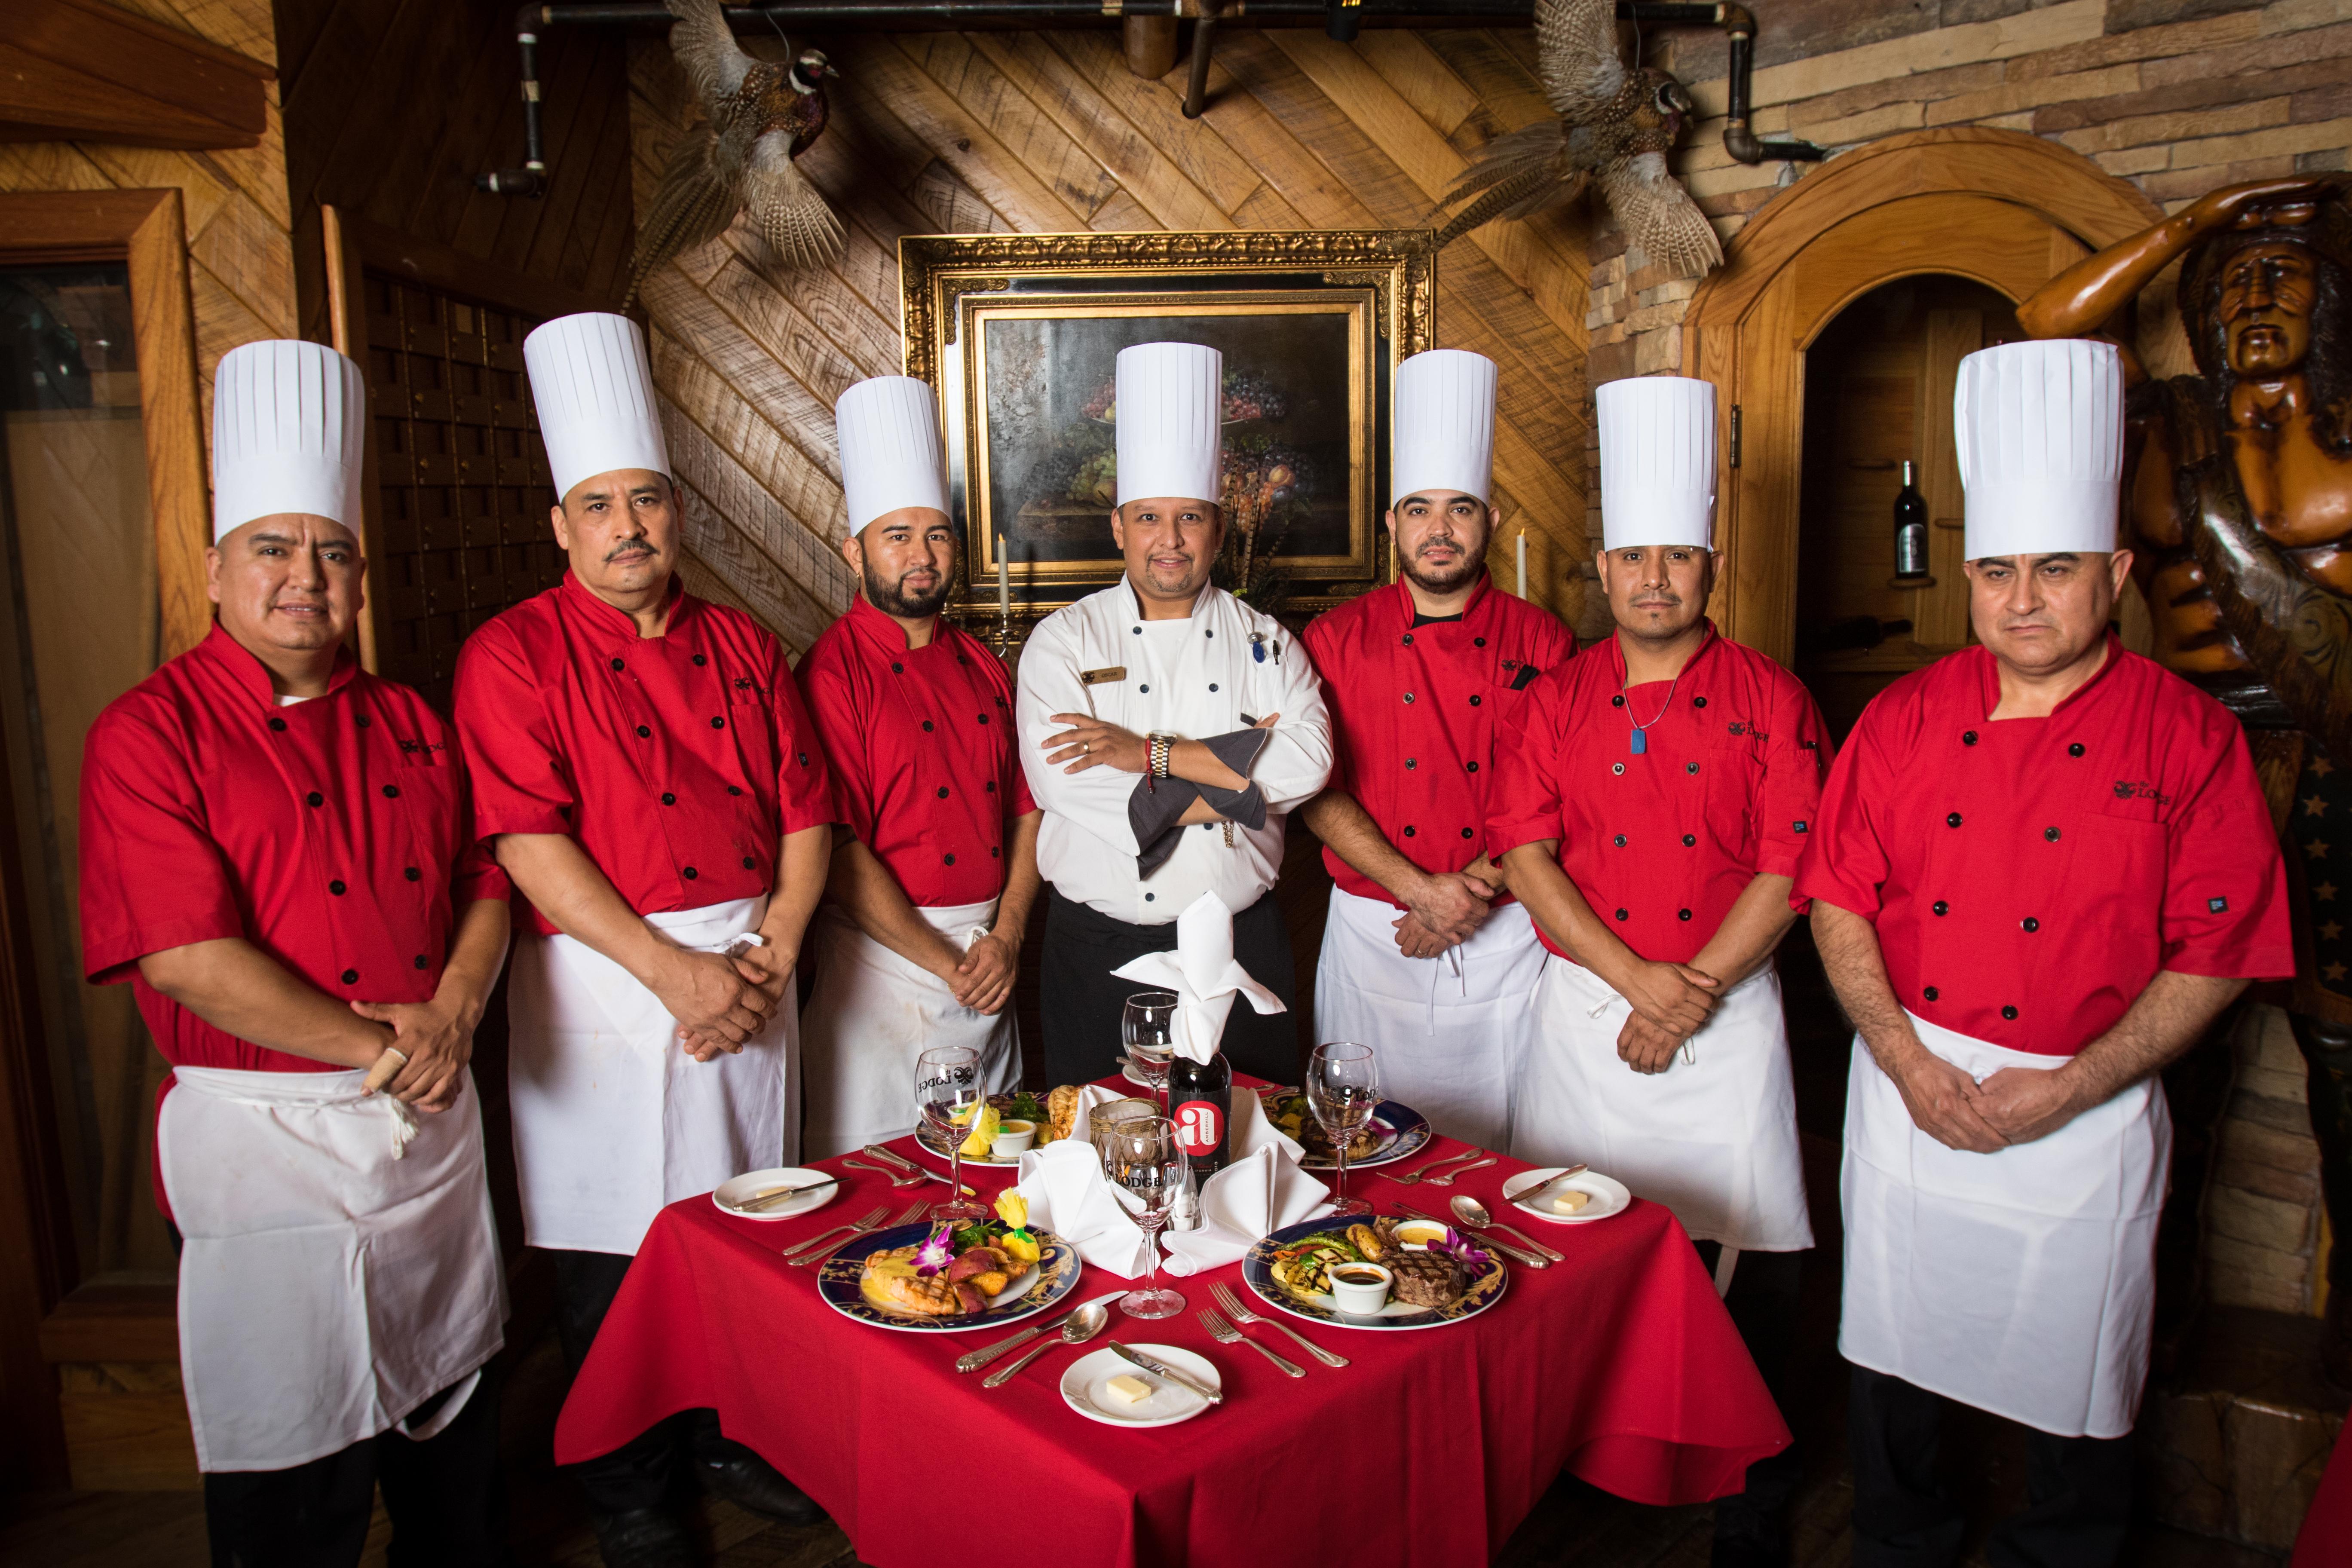 The Lodge Culinary Team